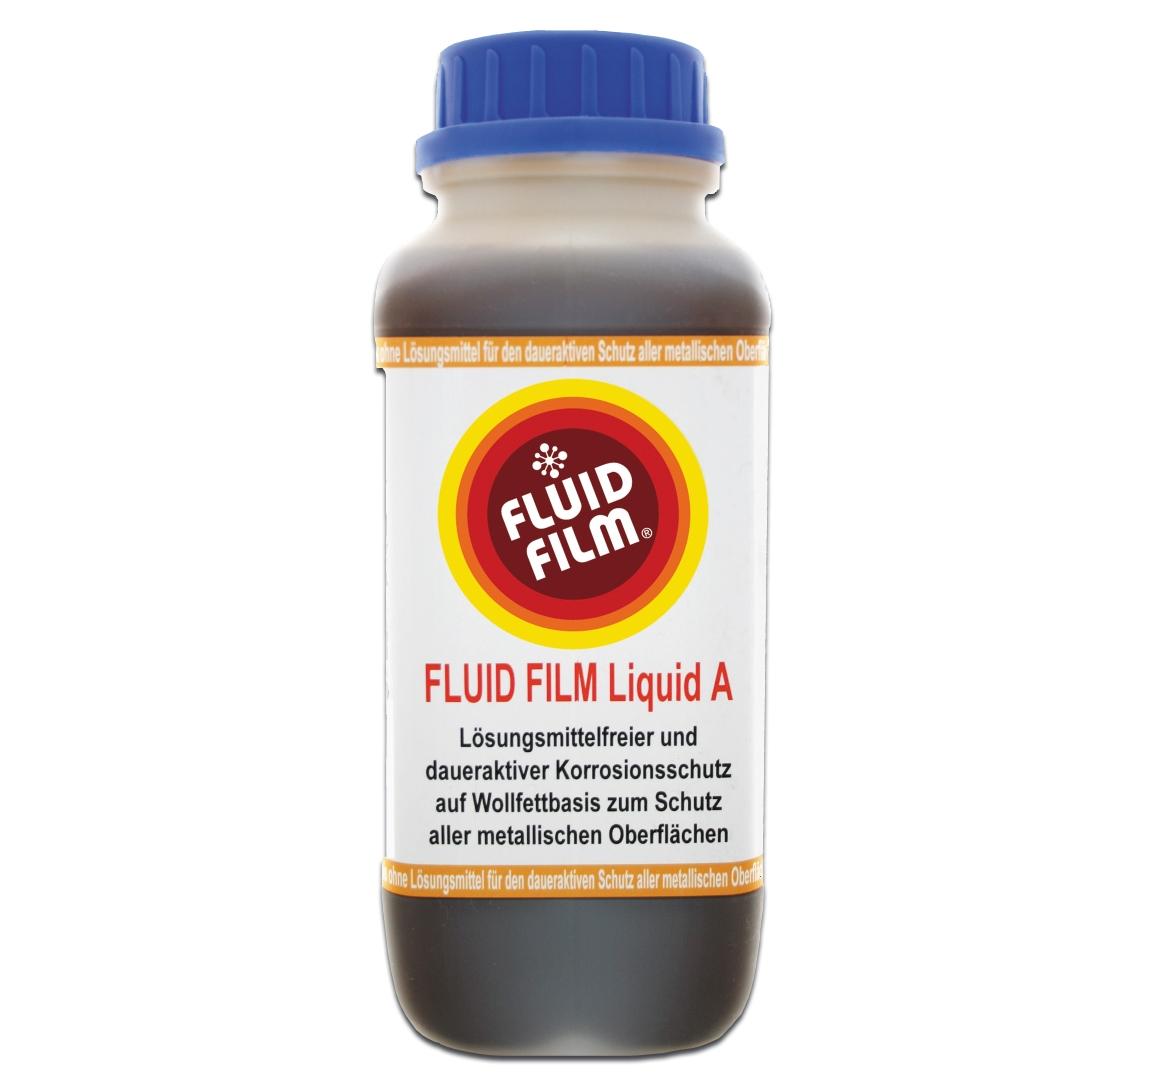 Fluid Film Liquid-A